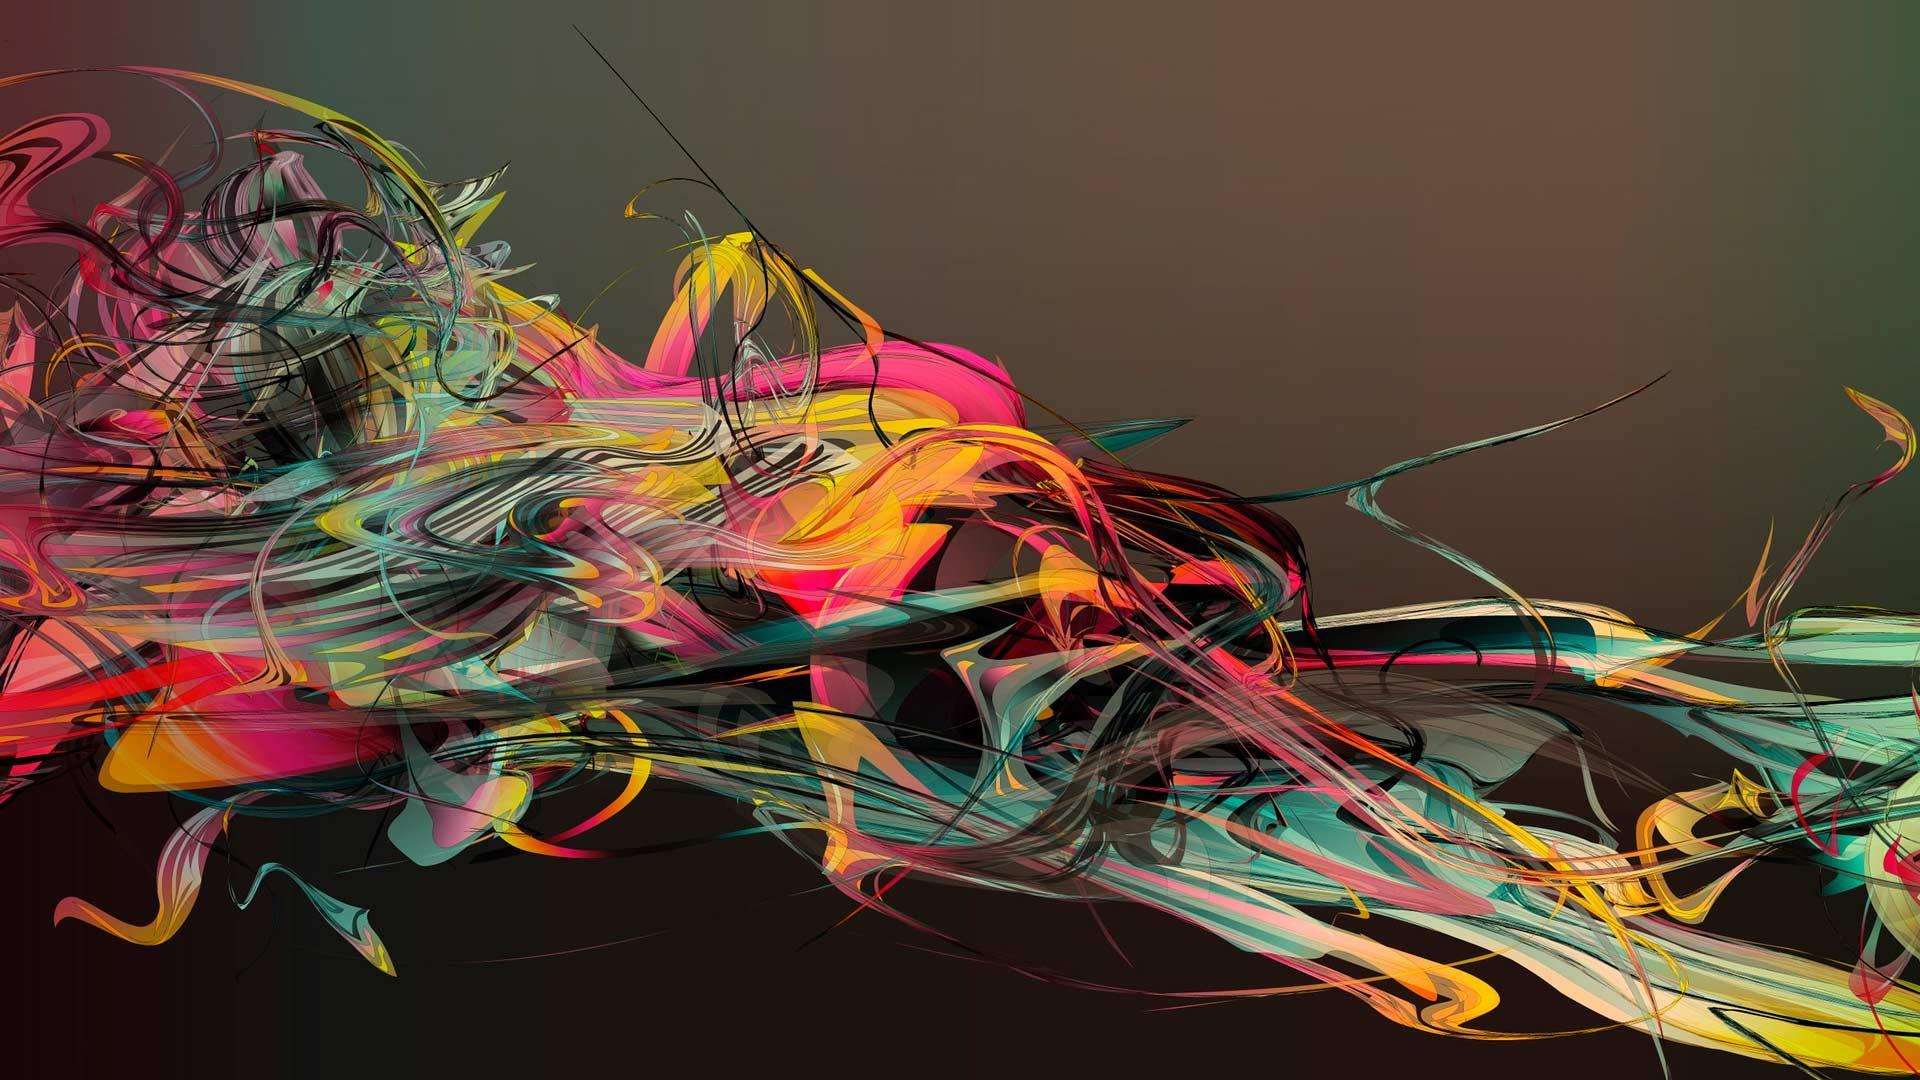 Digital Art Background picture hd